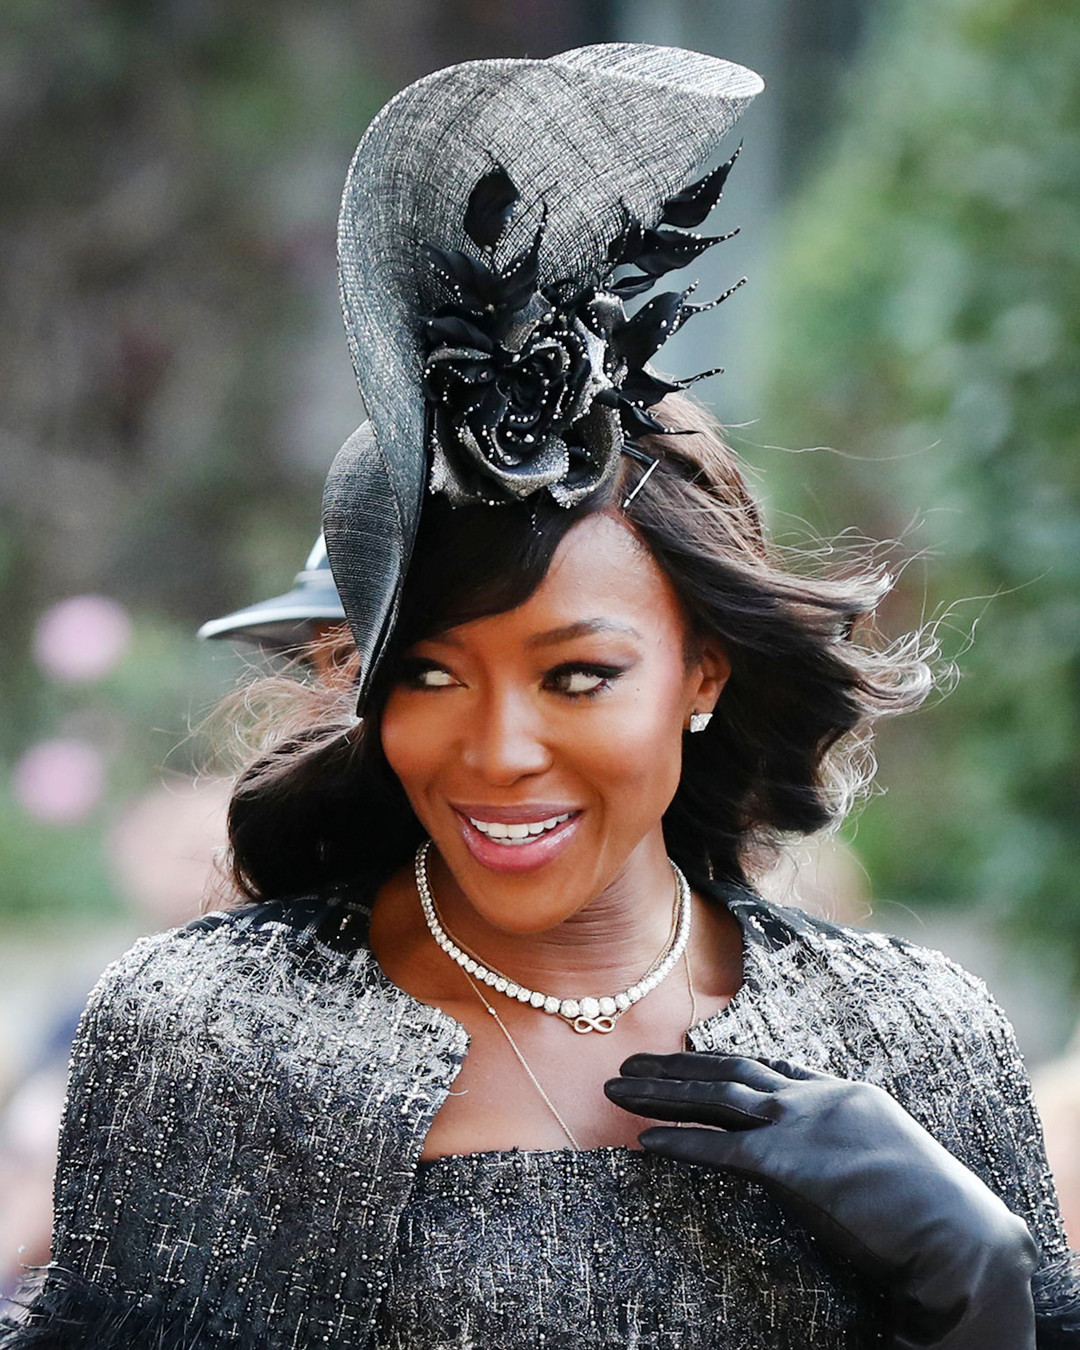 ESC: Royal Wedding, Pixie Geldof, Hats